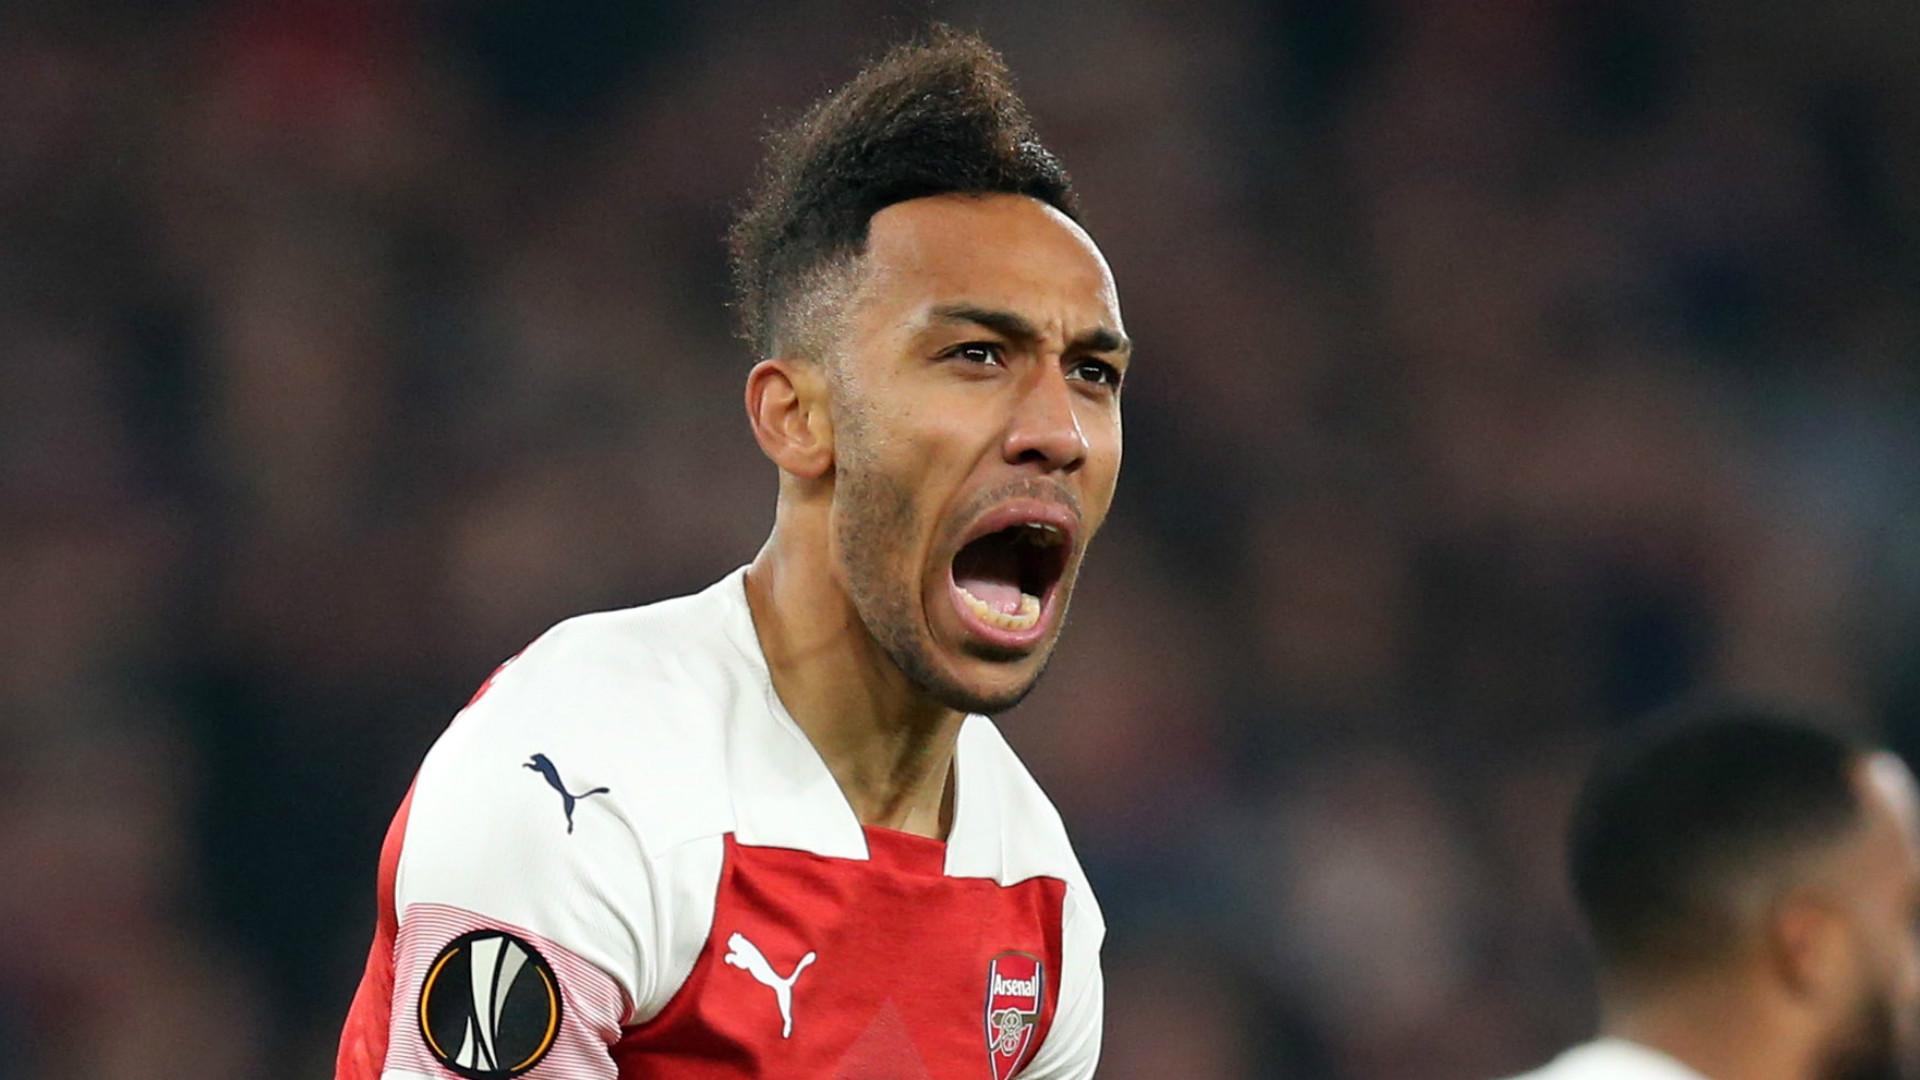 Arsenal star Pierre-Emerick Aubameyang up for Uefa Europa League award